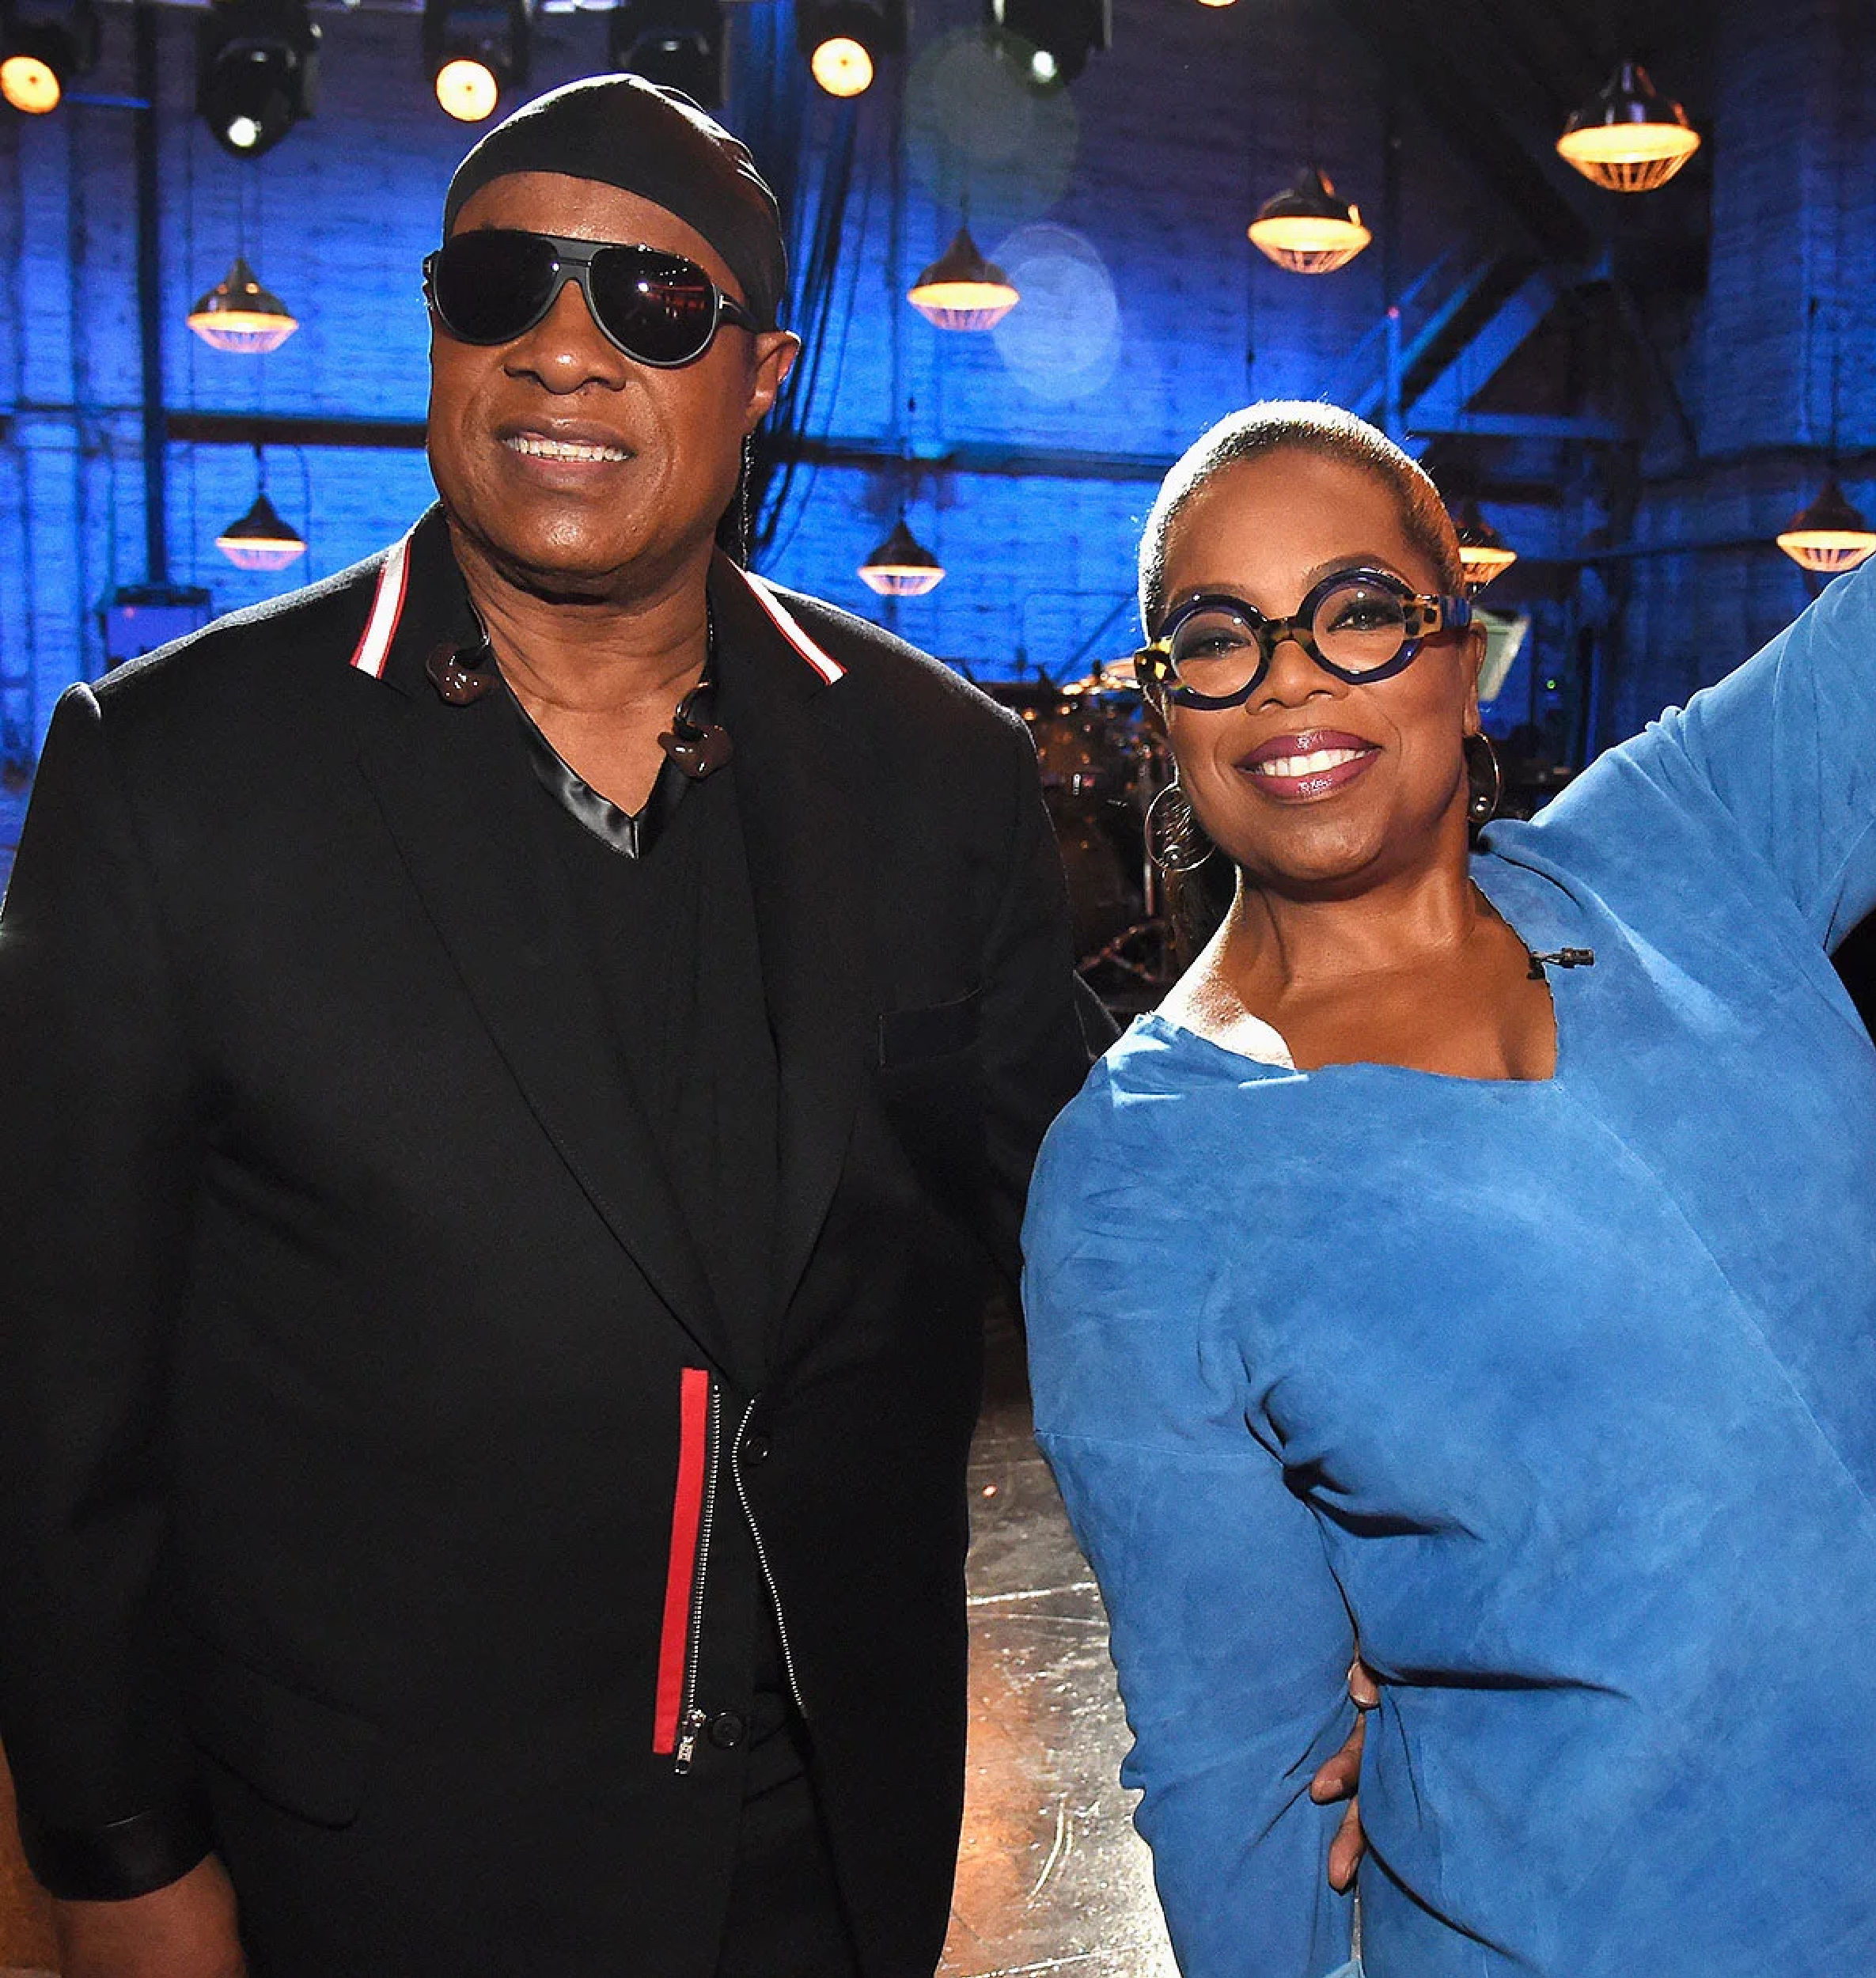 Stevie Wonder tells Oprah he's g